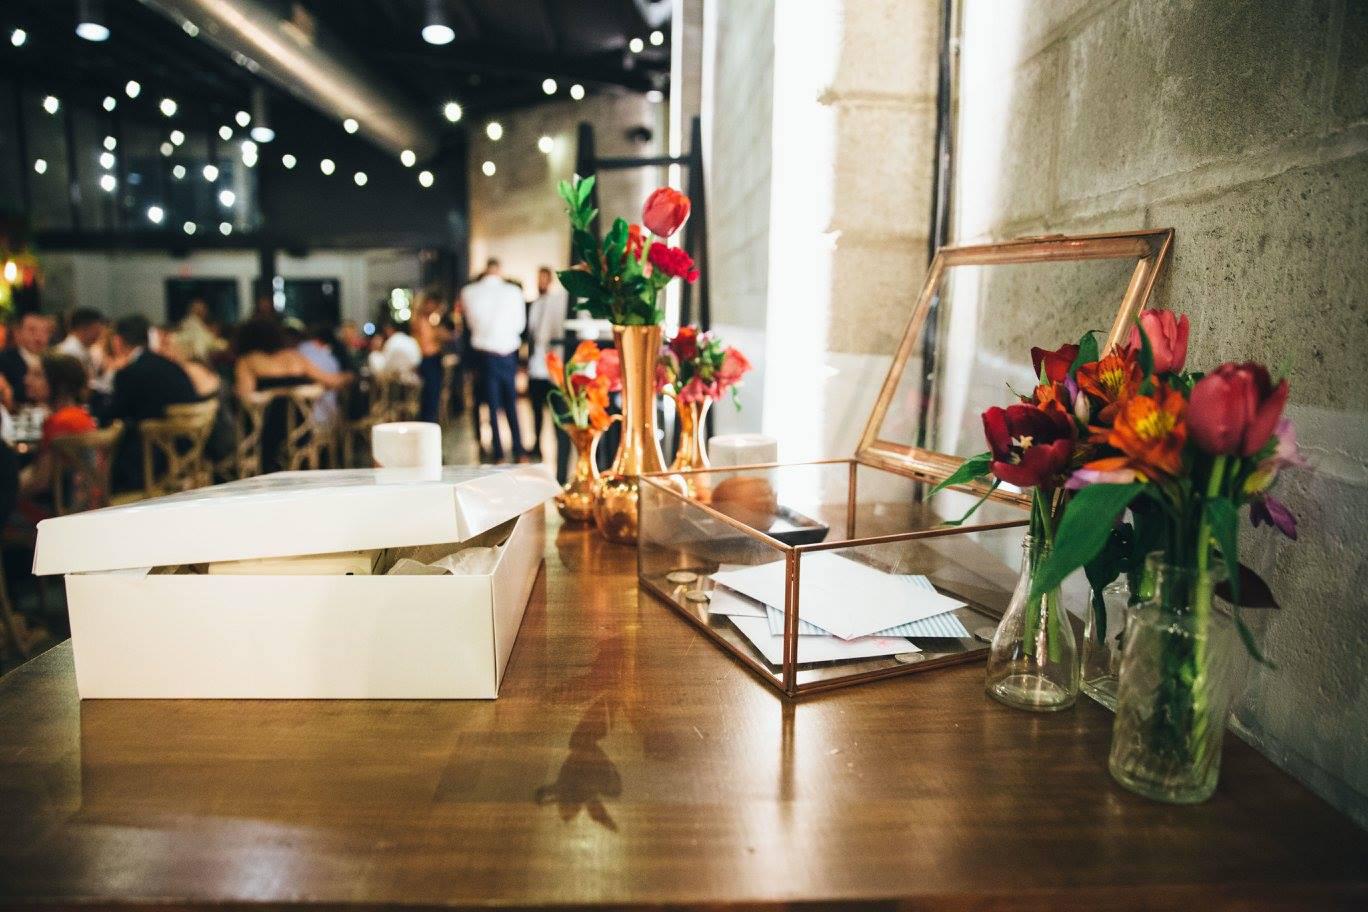 Glass Box Metallic Trim Rose Gold Vases - Copper & Gold Wedding Styling Inspiration - Yesterday Creative Letterpress - Blog